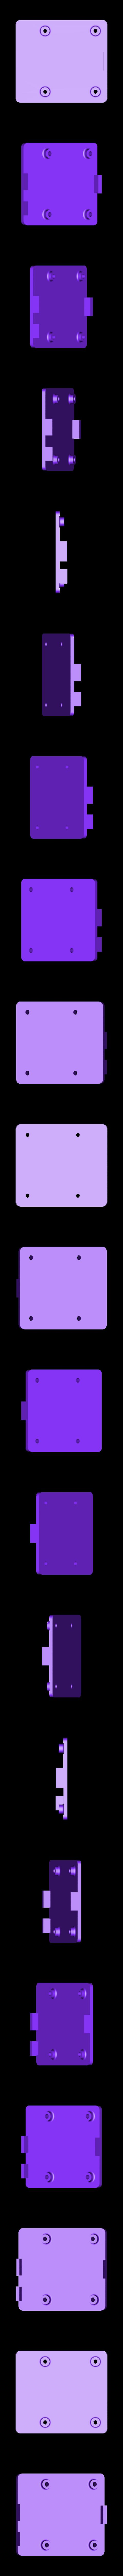 NIZ.stl Download STL file BOX for PCM2704 USB DAC • 3D printer template, URkA